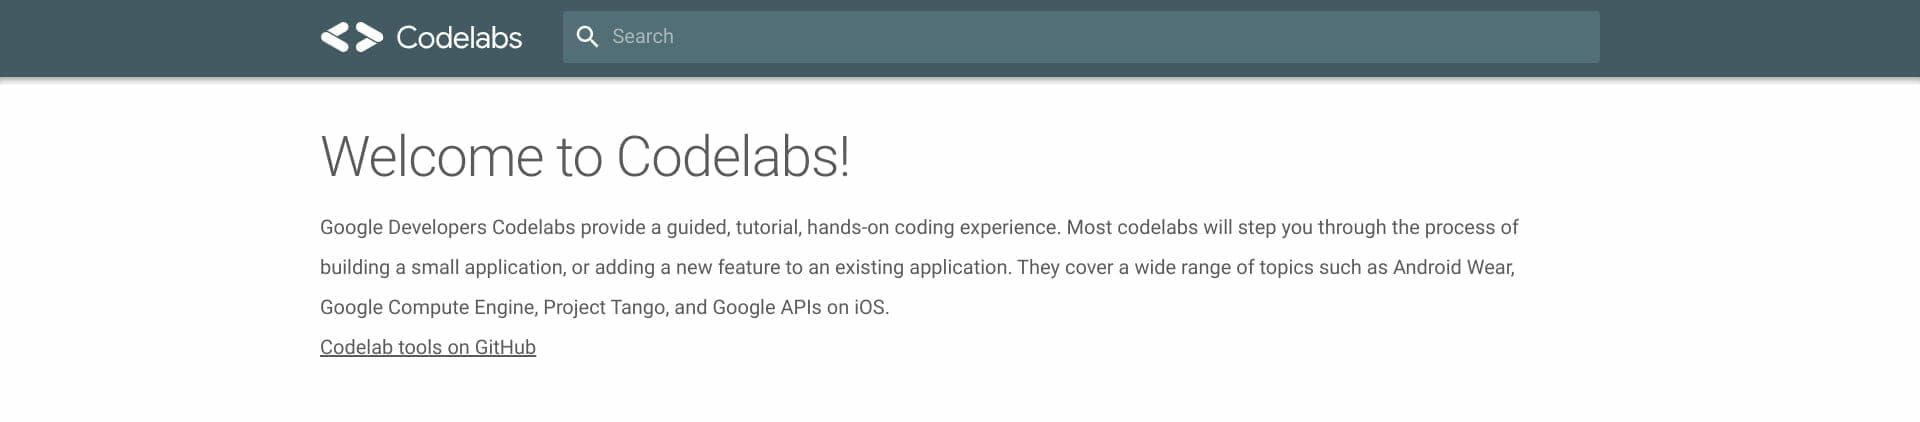 Google Developers Codelabs